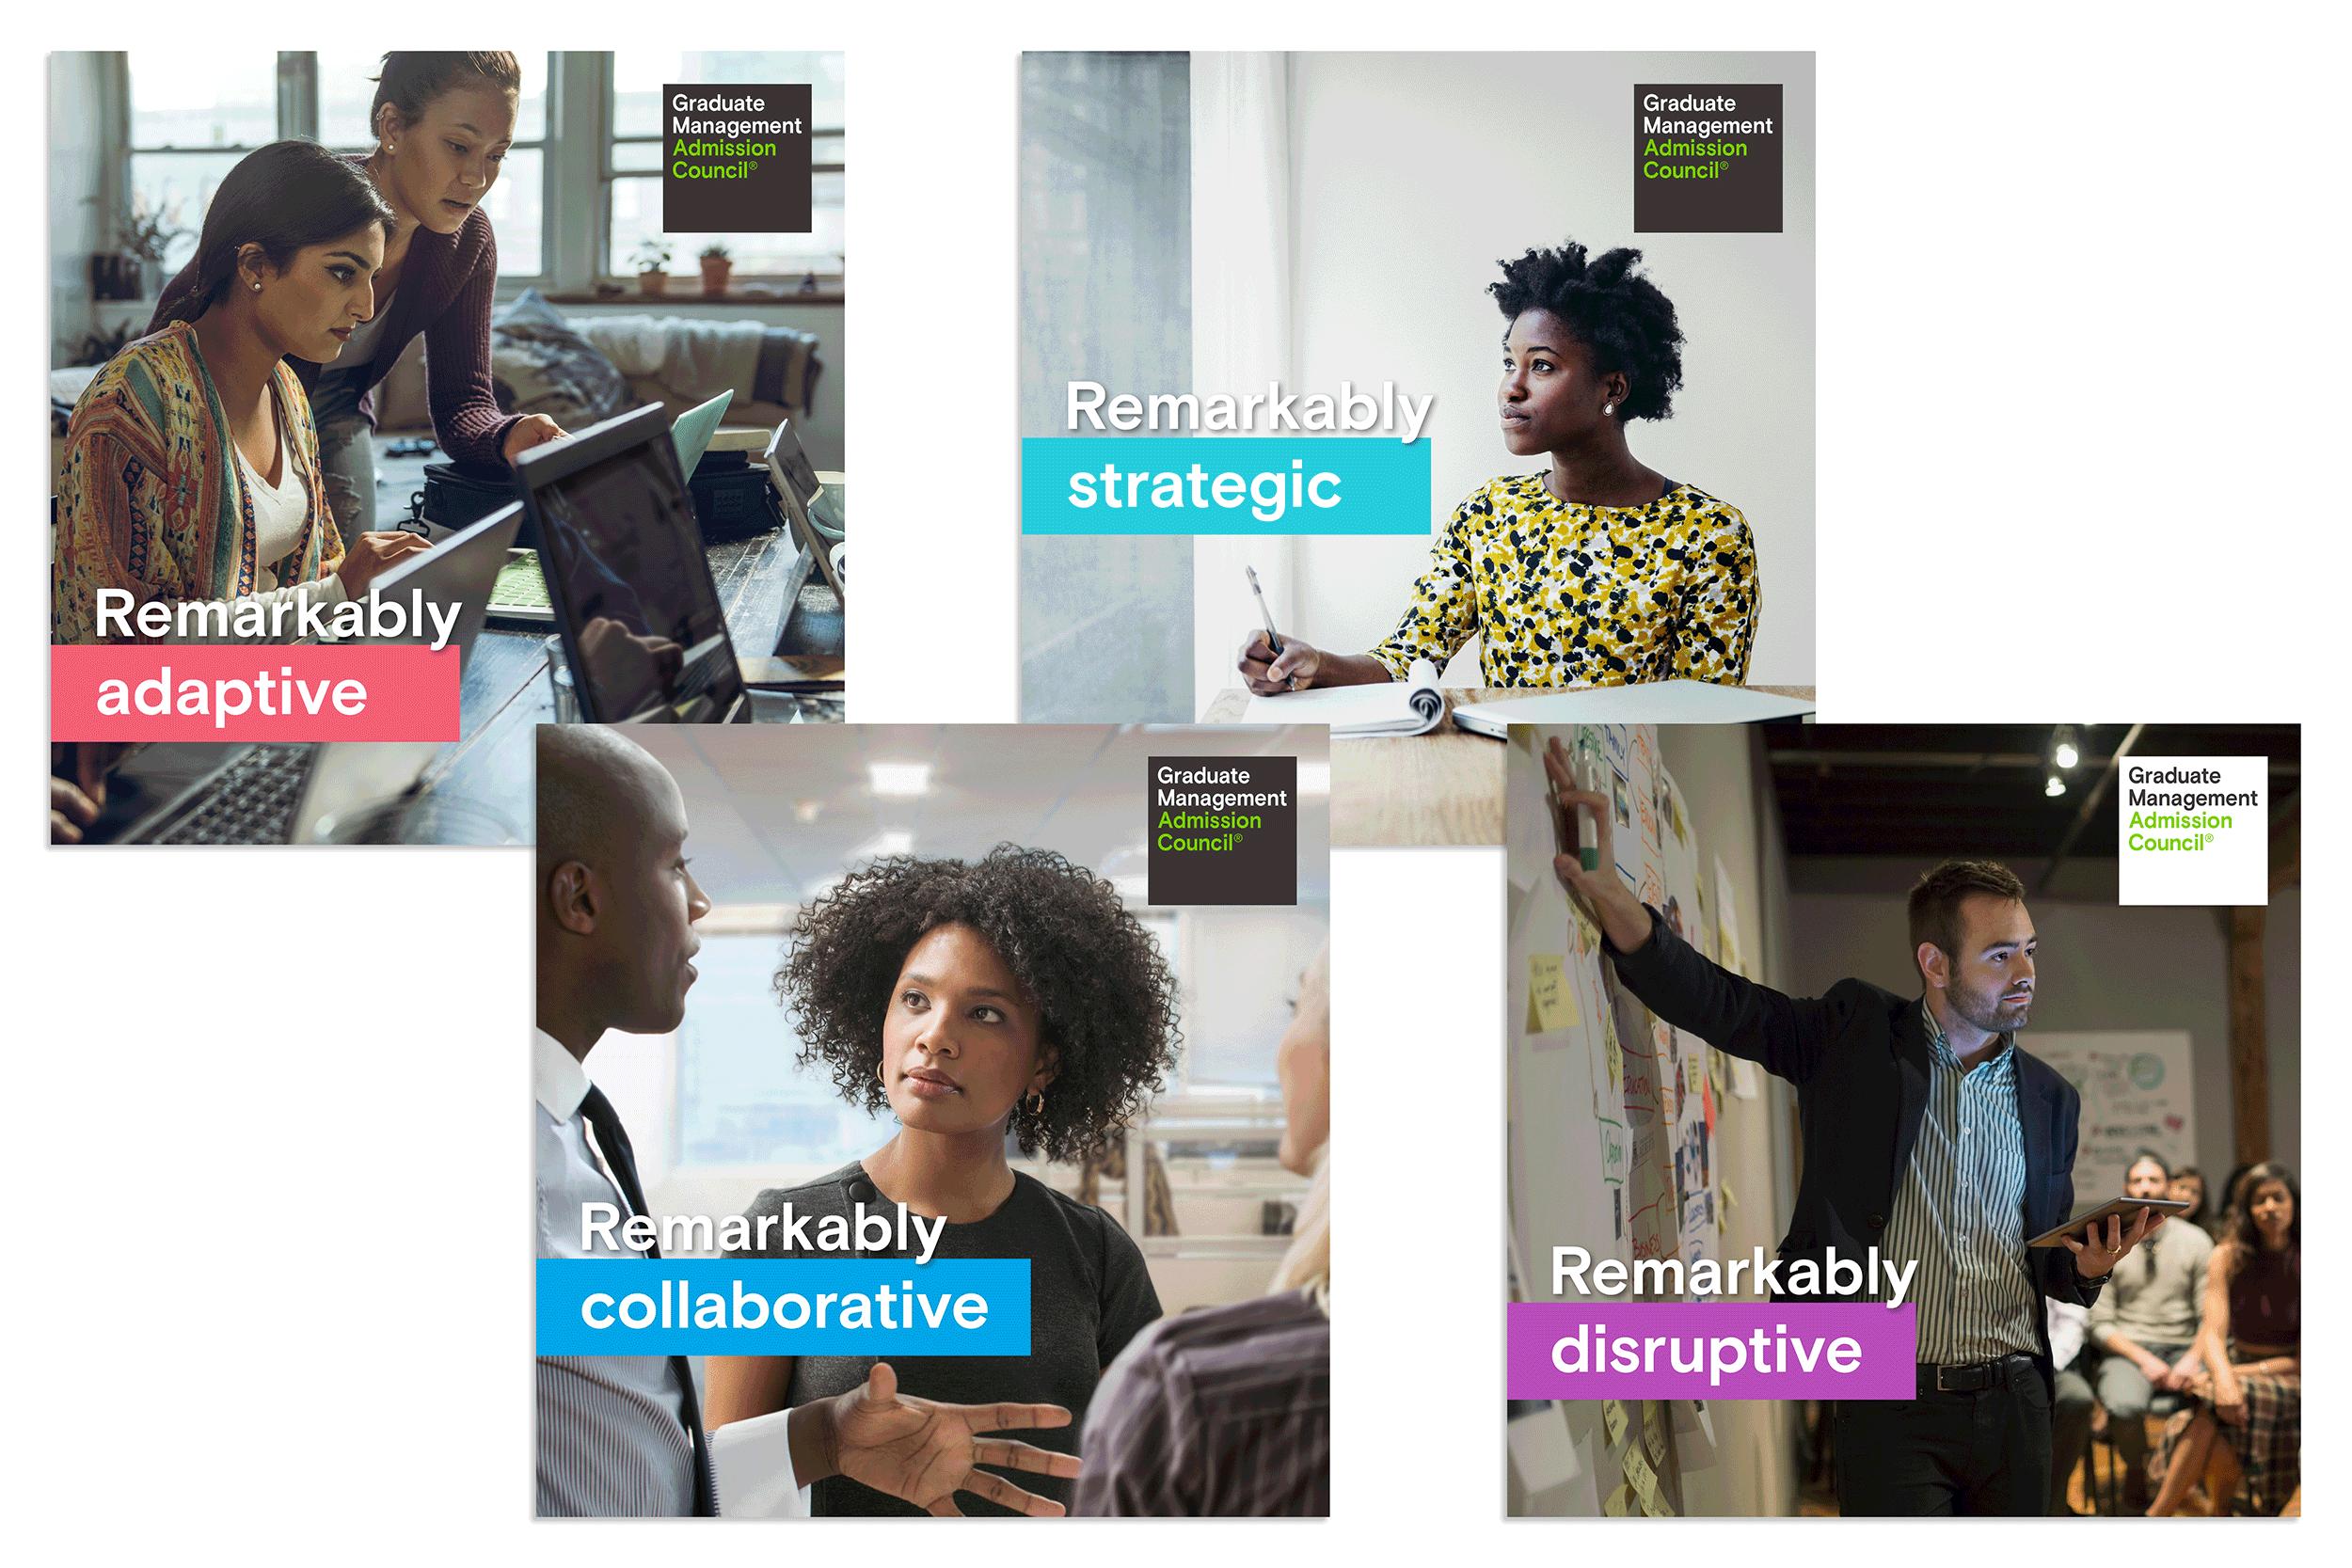 Digital marketing design by Virtual Apiary